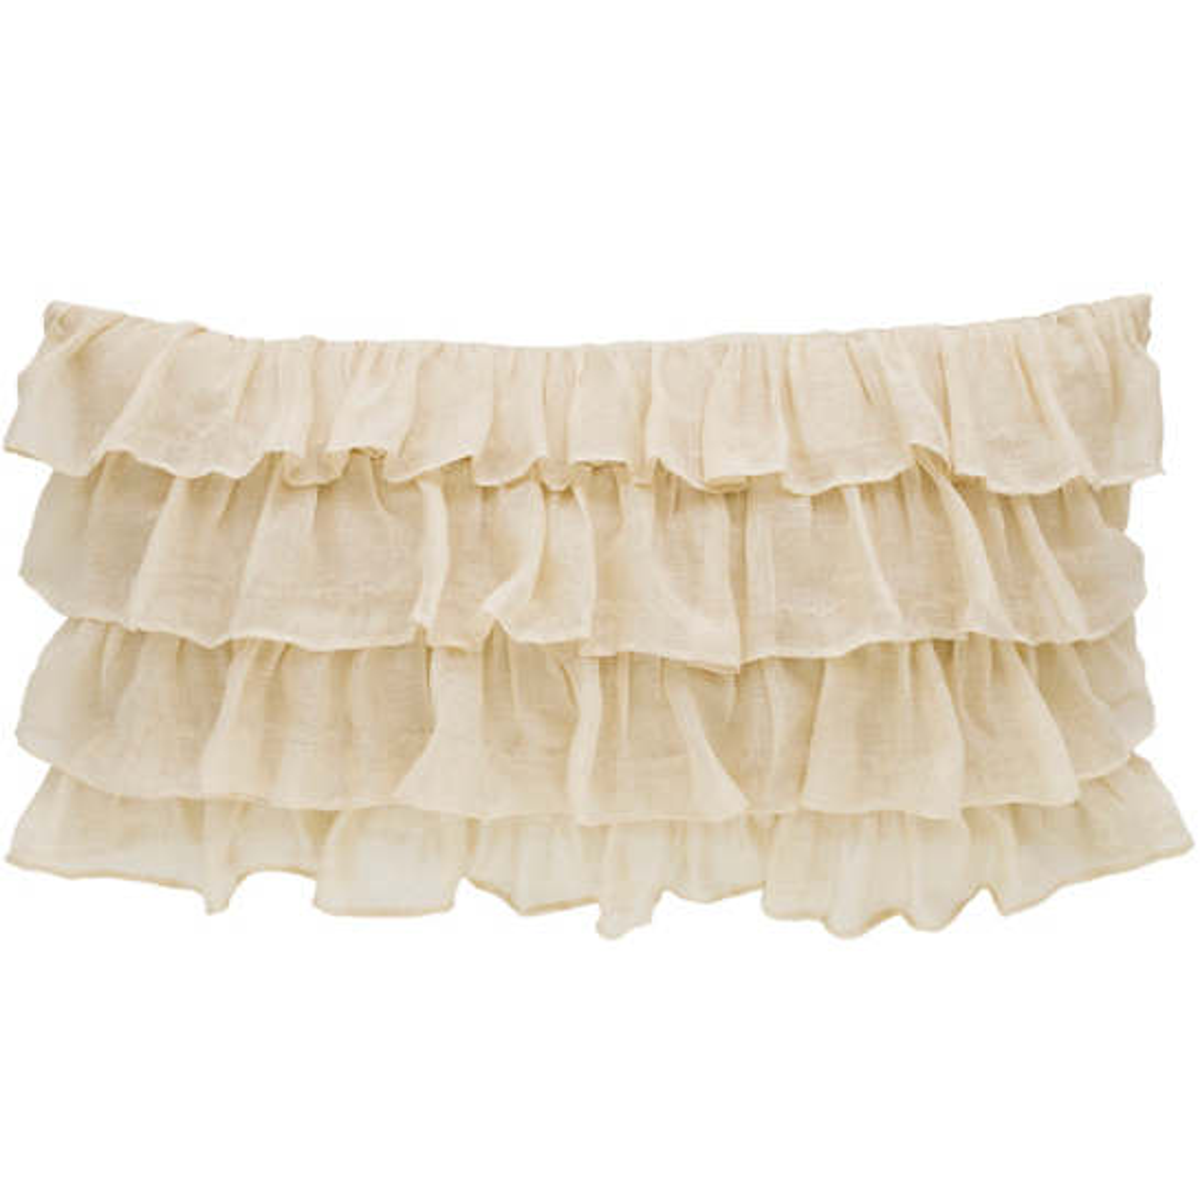 Savannah Linen Gauze Tea Stain Tier Ruffle Decorative Pillow